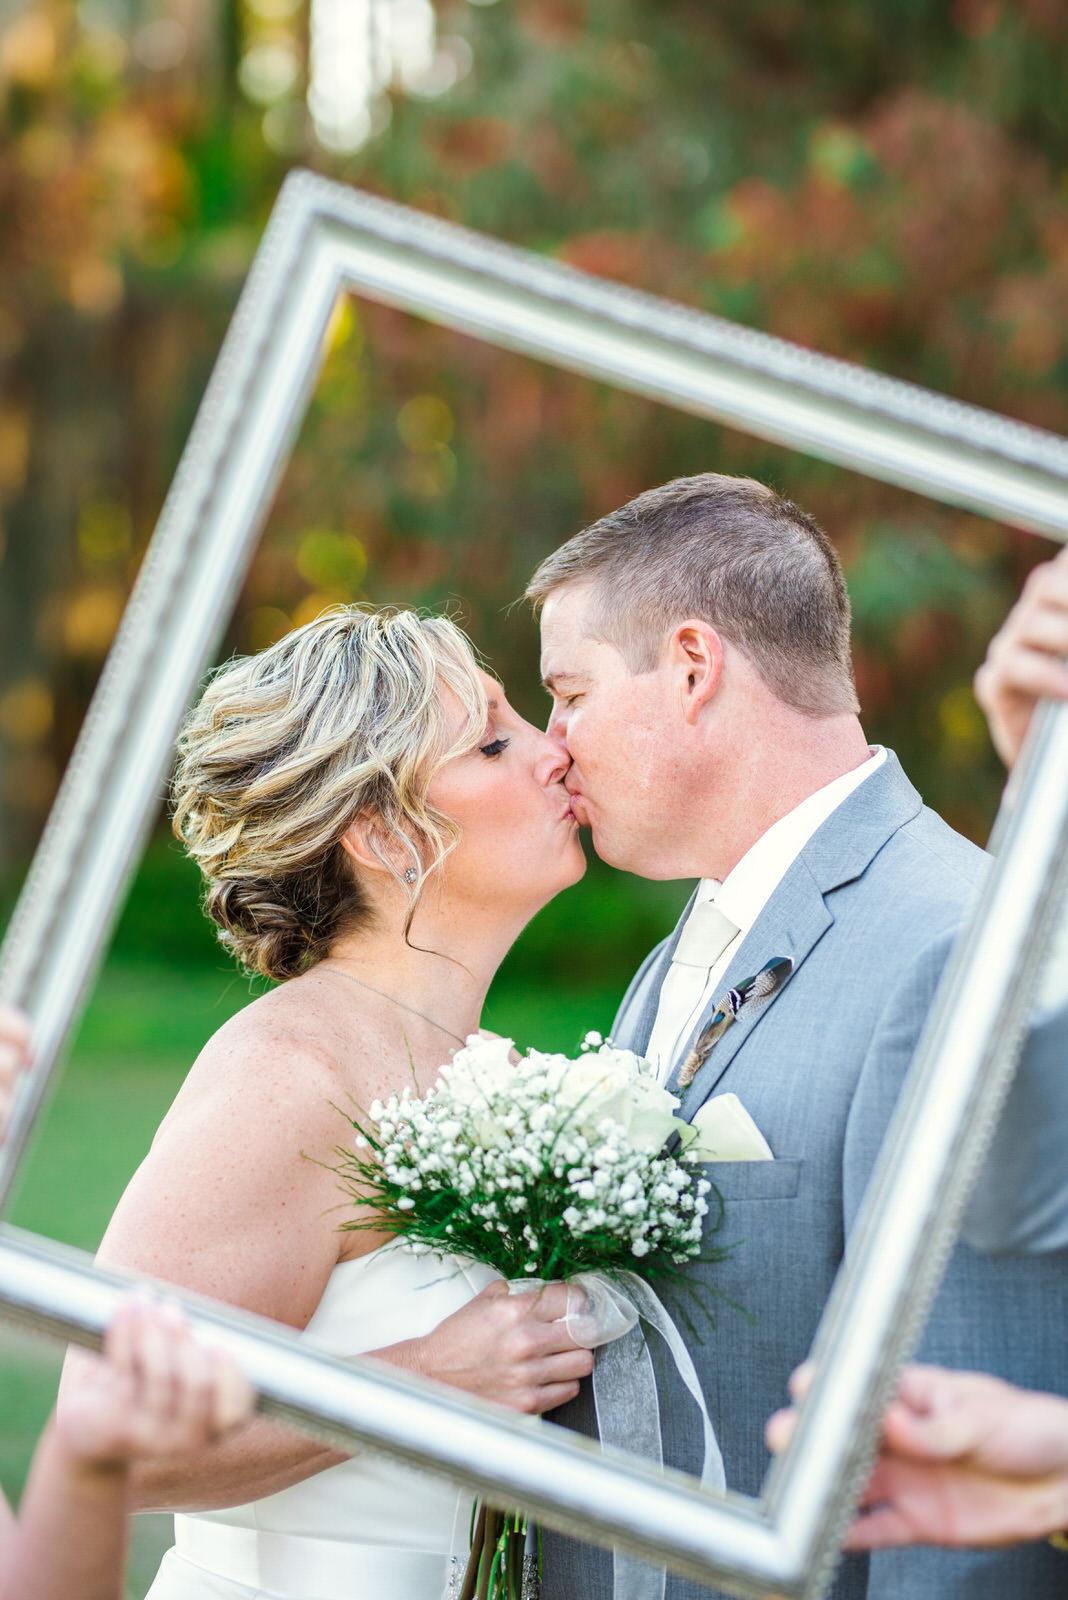 Mike_&_Barbaras_Wedding_3_24_2018-203.jpg